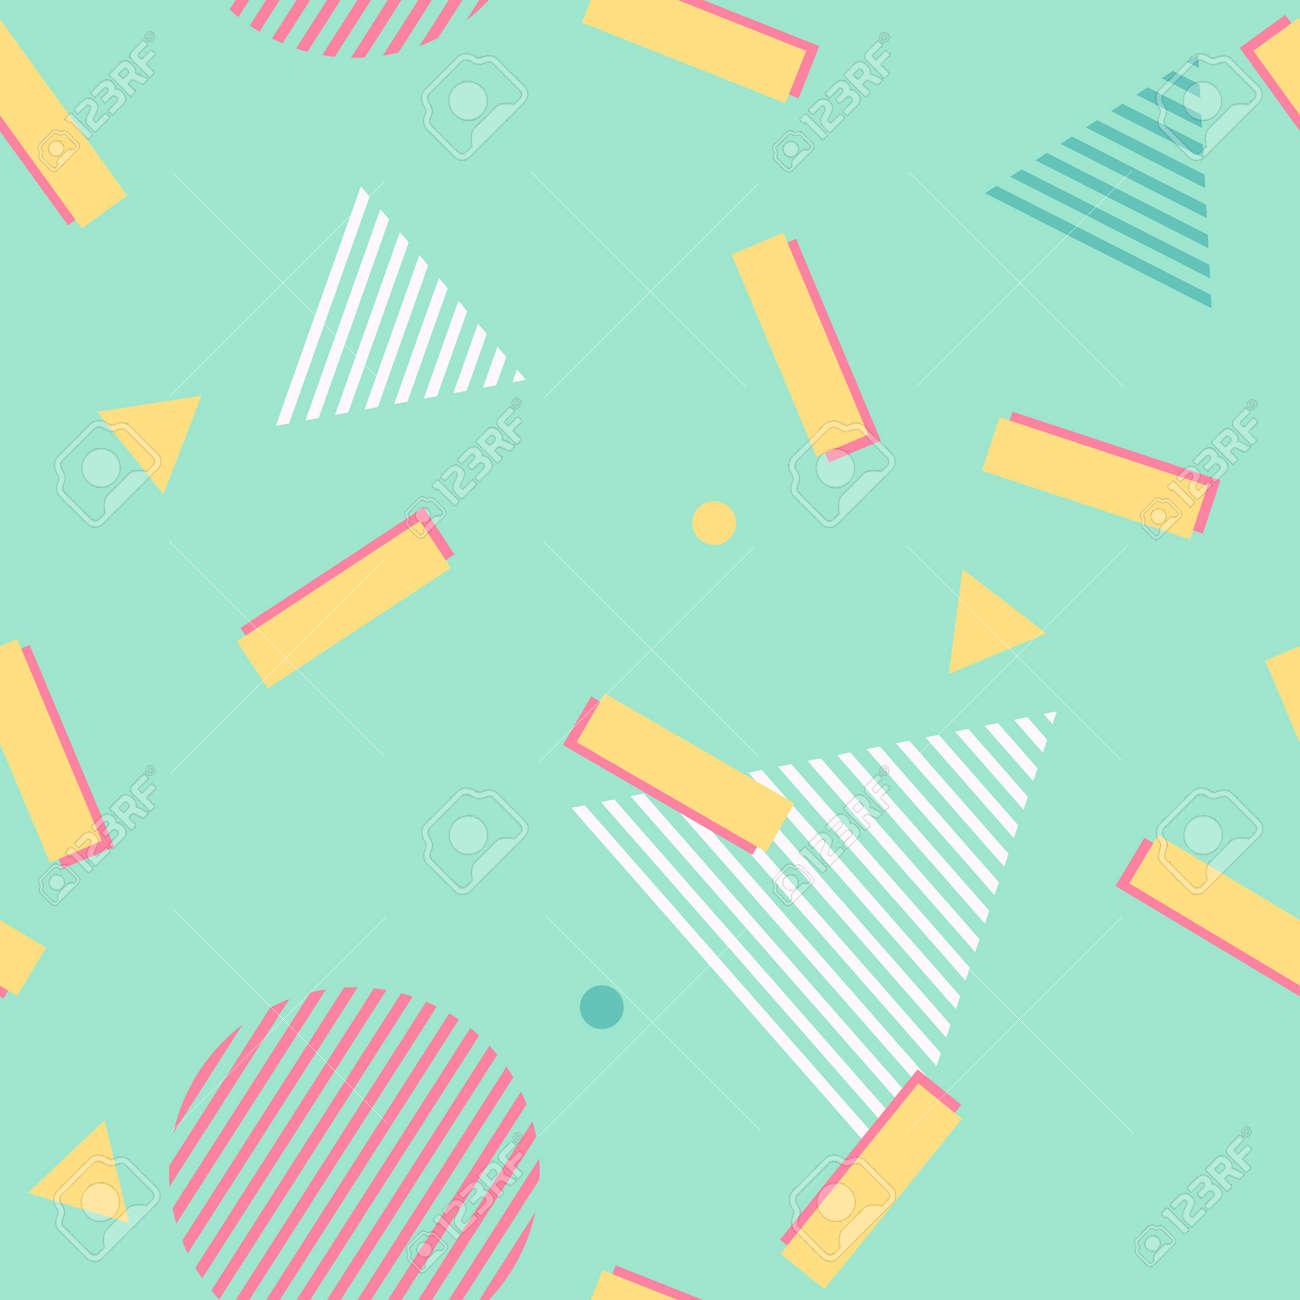 80s Pattern Cool Design Ideas